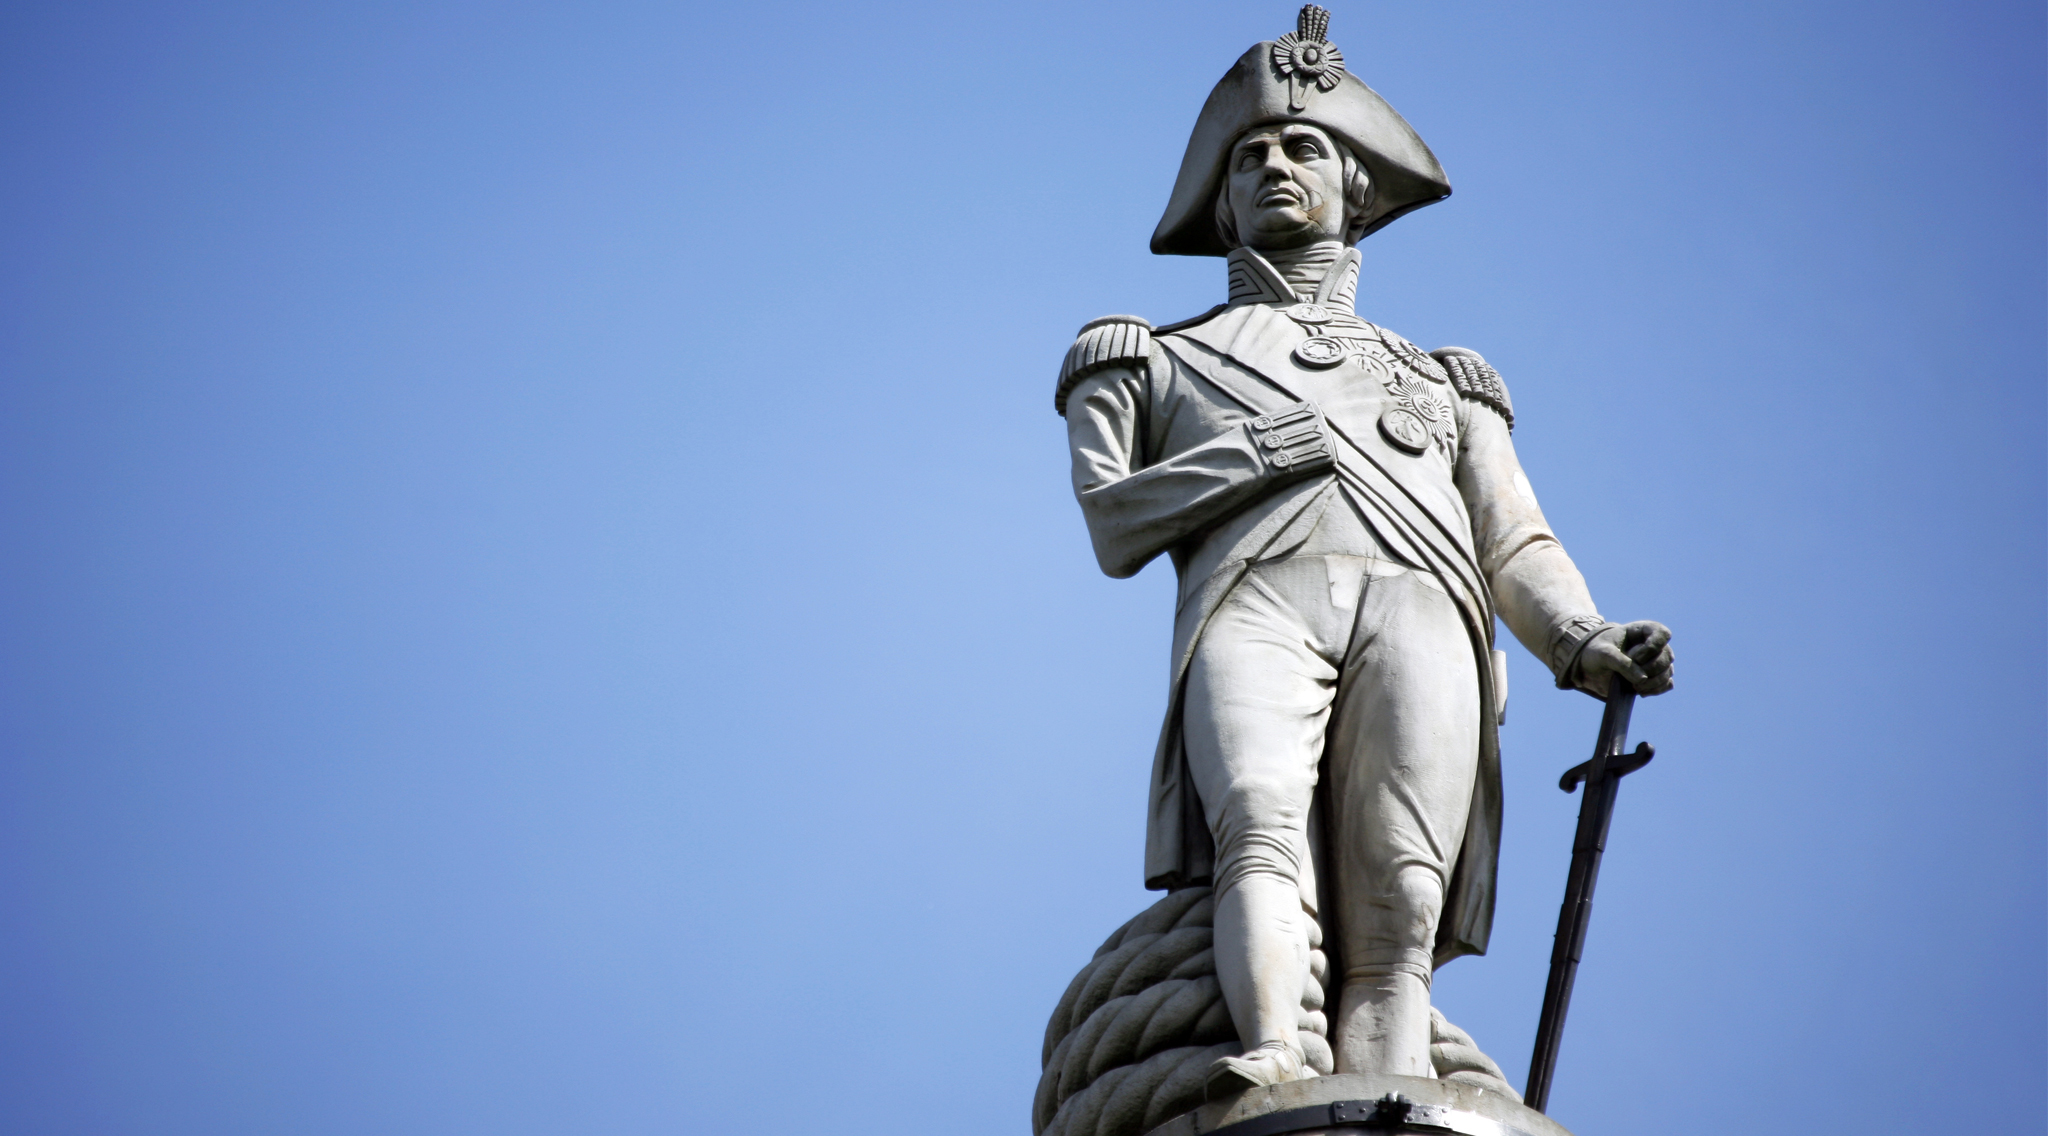 The top 20 public sculptures in London